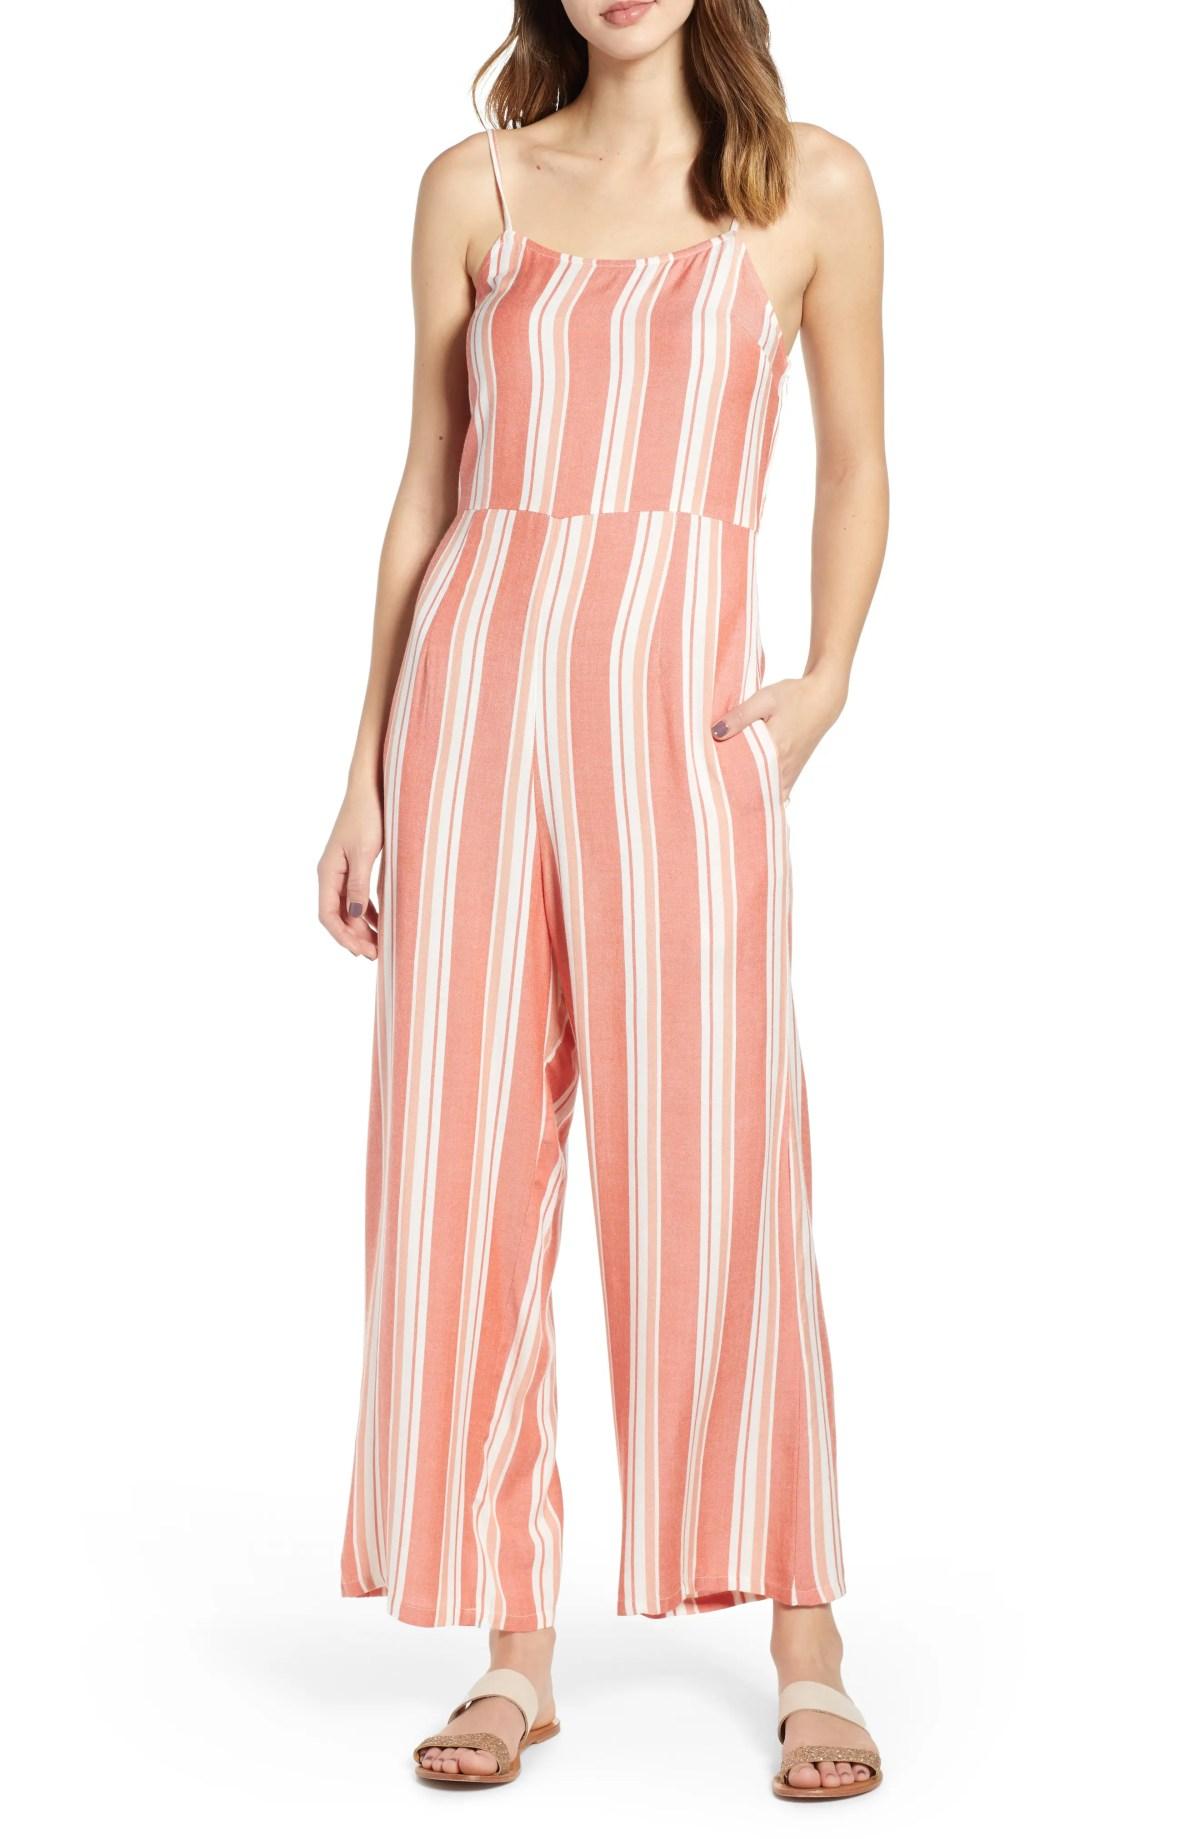 LIRA CLOTHING Hop Along Stripe Jumpsuit, Main, color, RED OCHRE